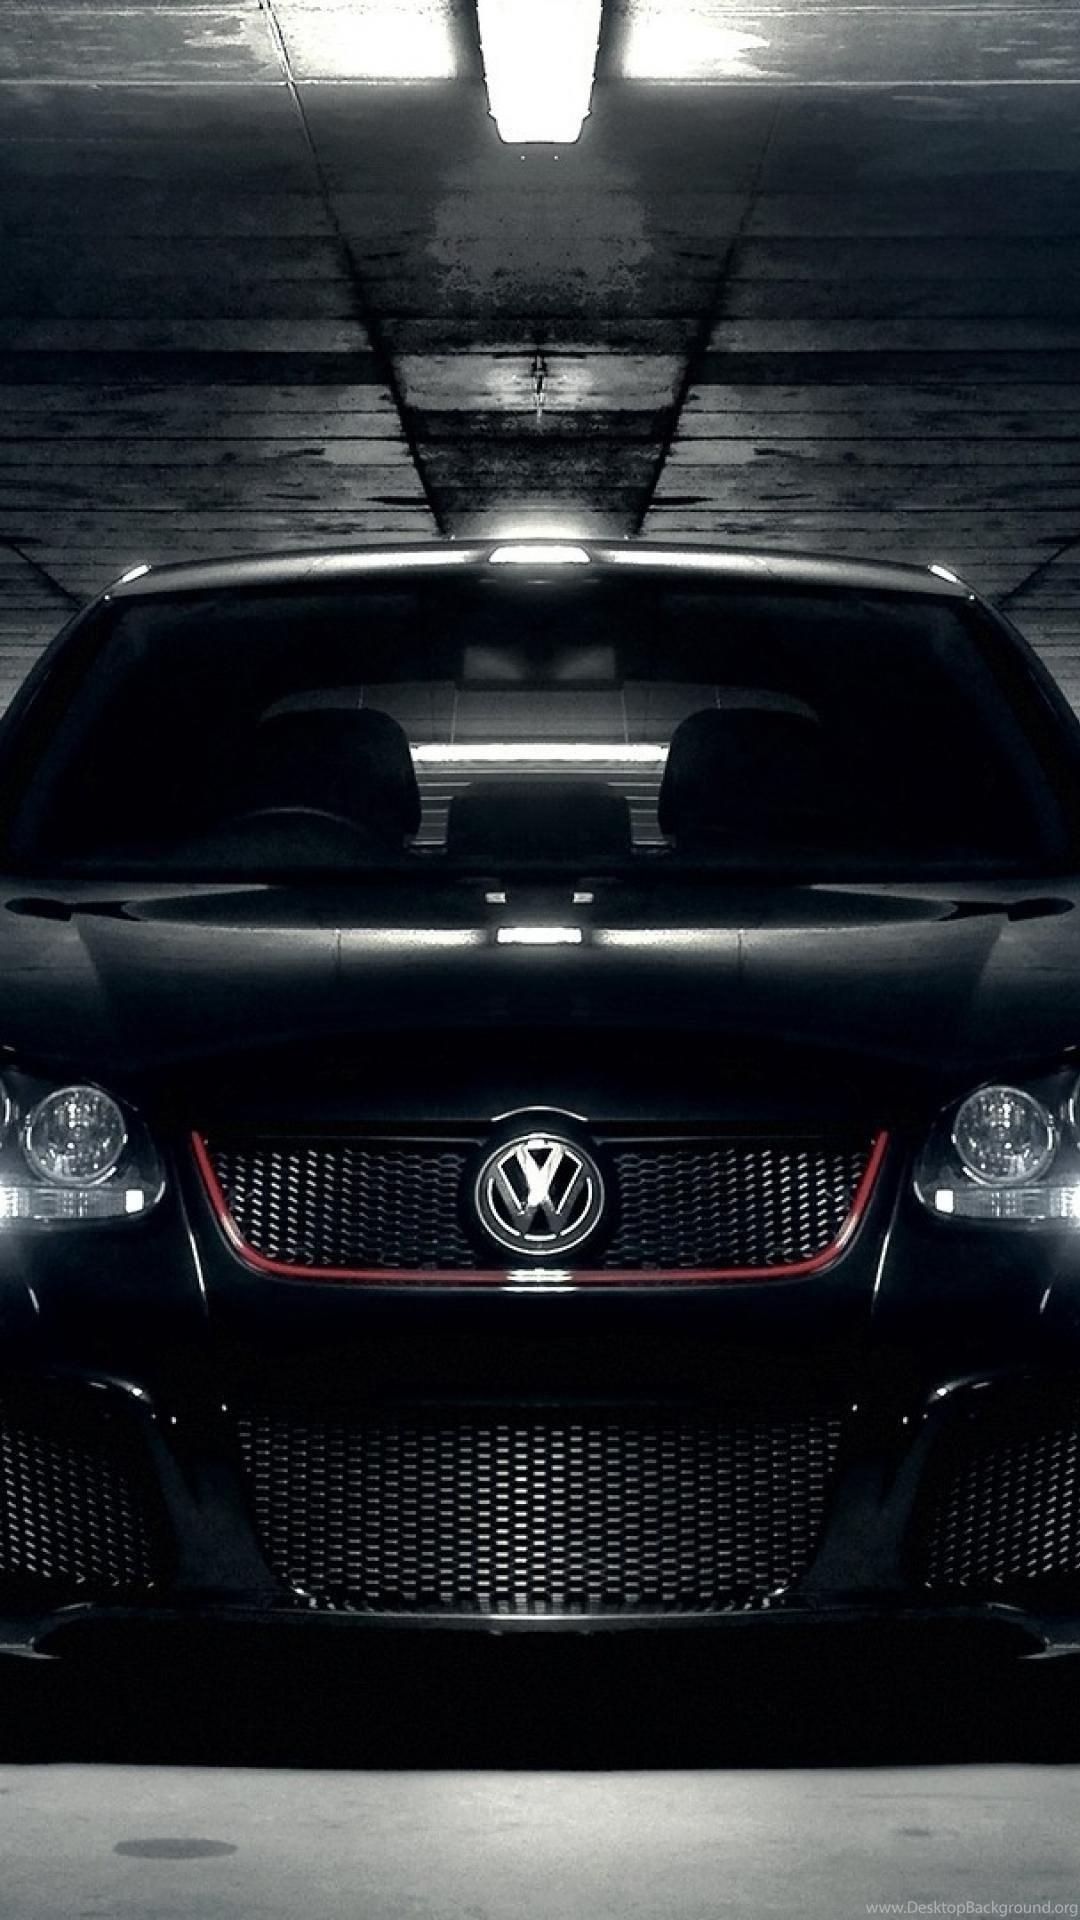 Garages Front View Volkswagen Golf V Wallpapers Desktop Background